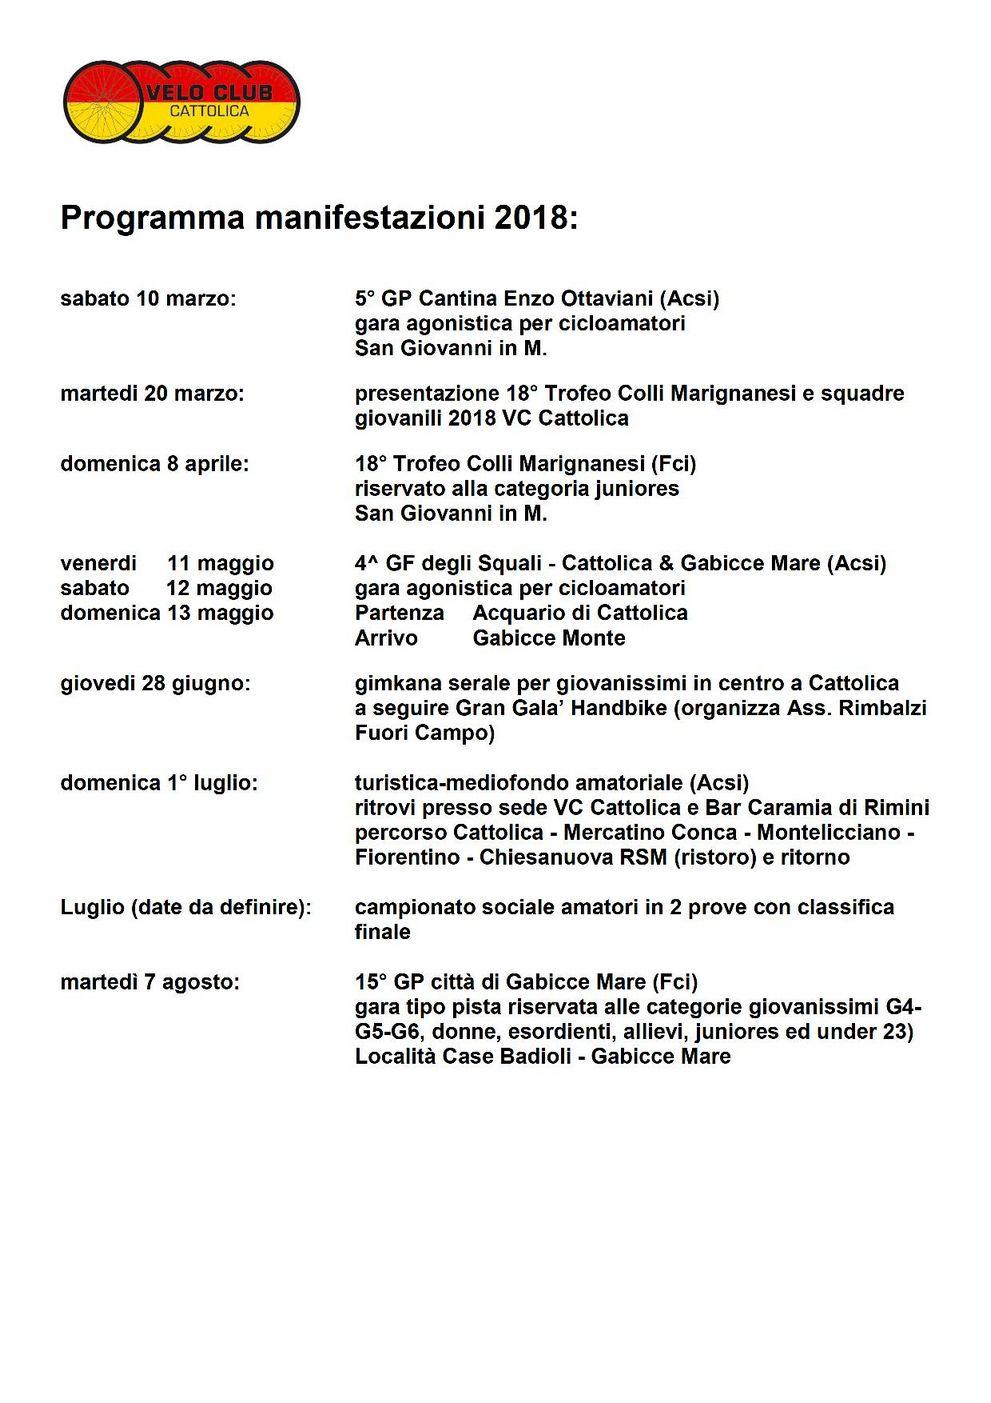 programma manifestazioni 2018